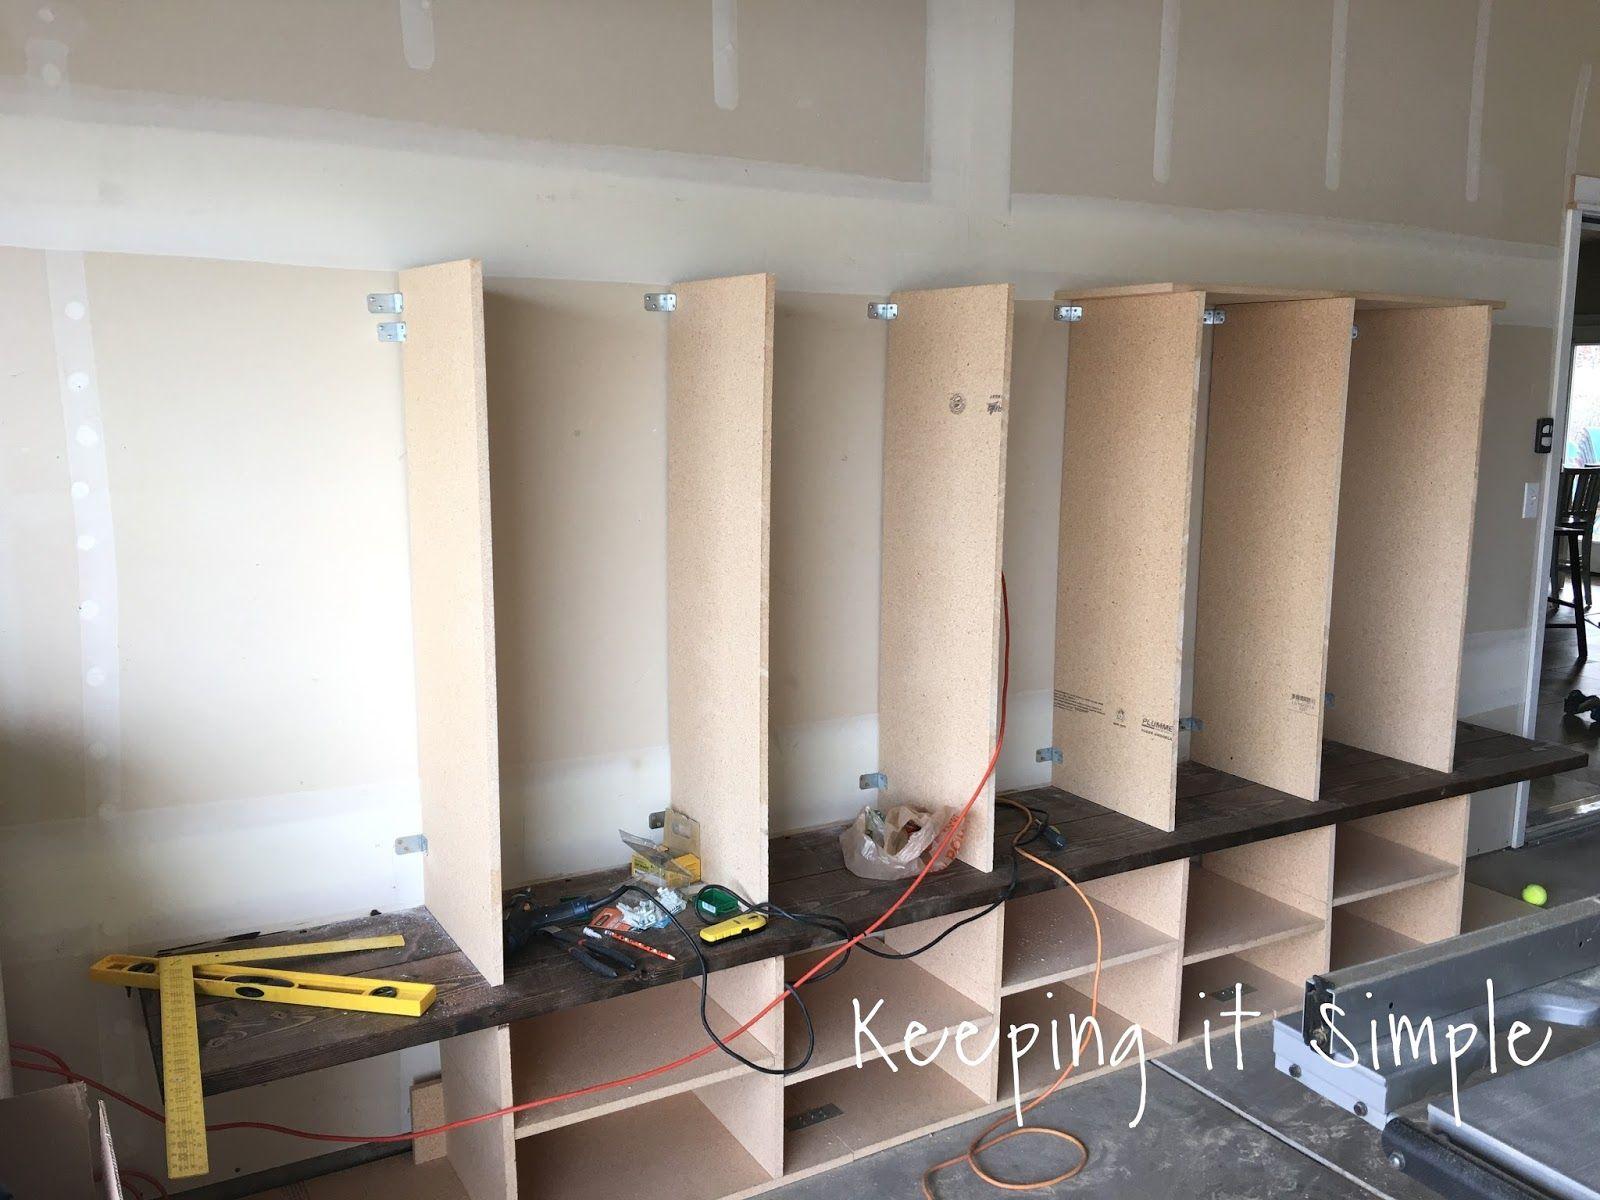 Diy Garage Mudroom Lockers With Lots Of Storage Keeping It Simple Garage Decor Garage Lockers Mudroom Lockers